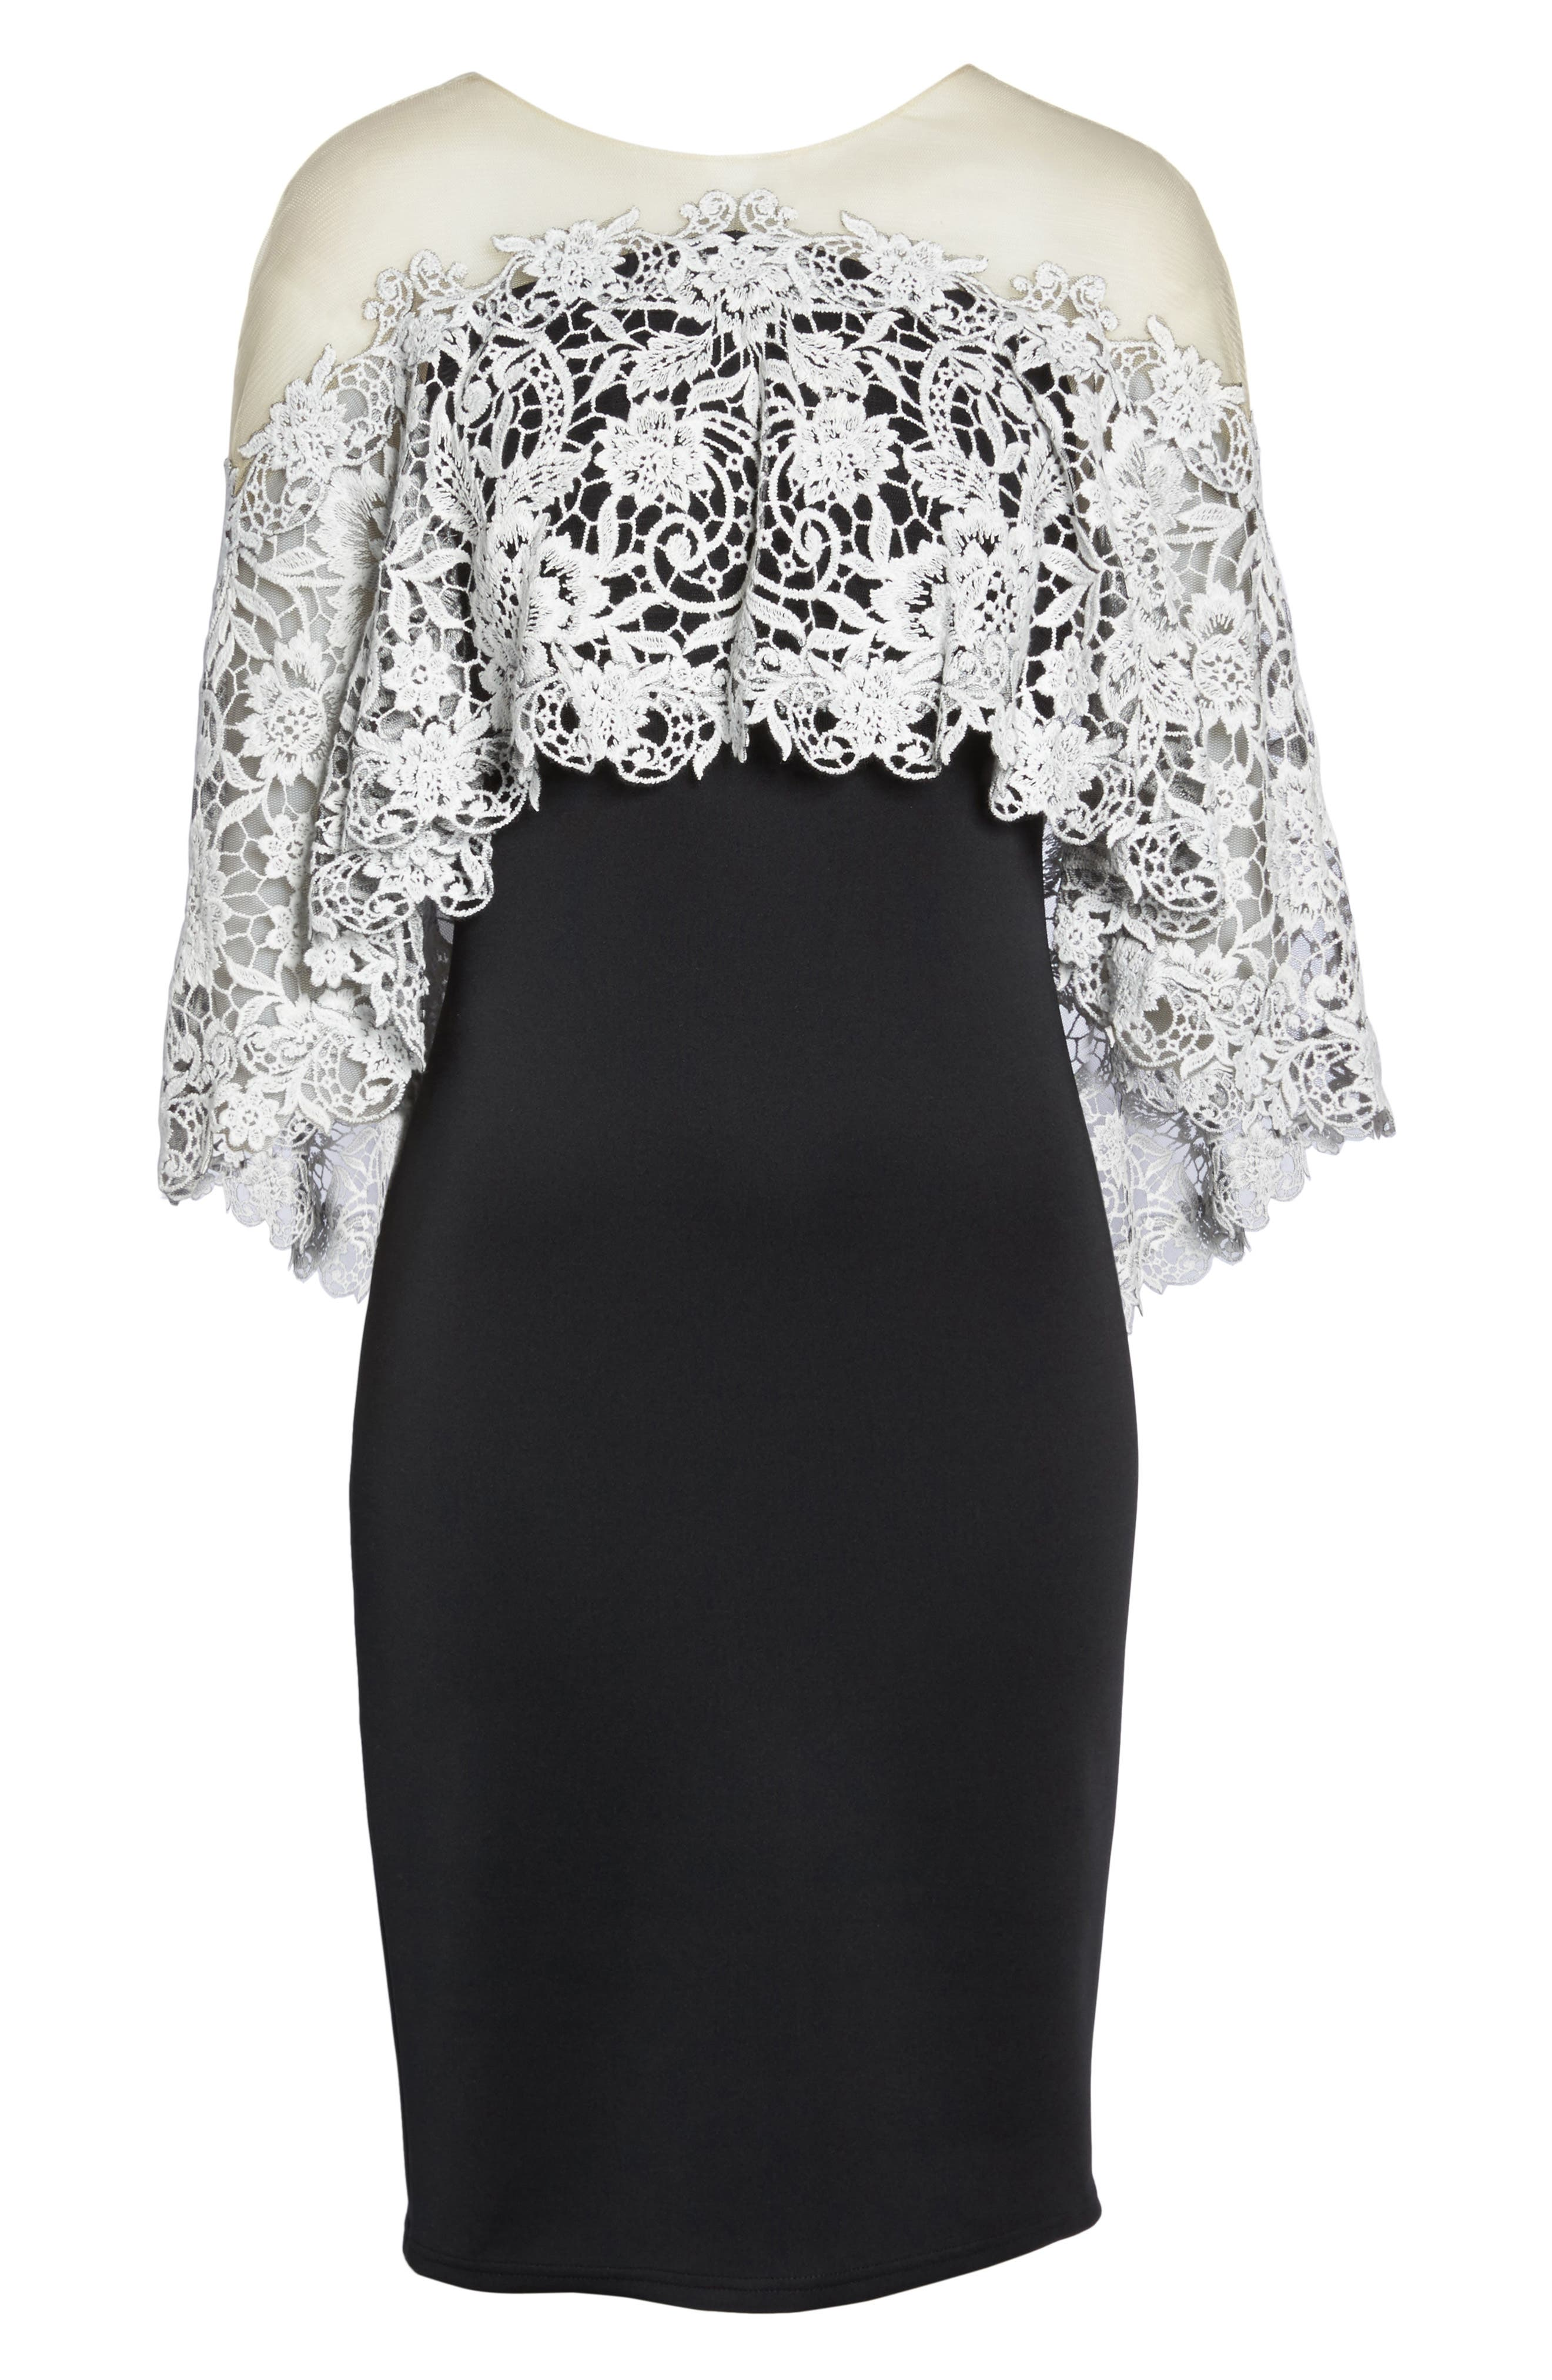 Illusion Neck Cape Dress,                             Alternate thumbnail 6, color,                             Black/ Ivory